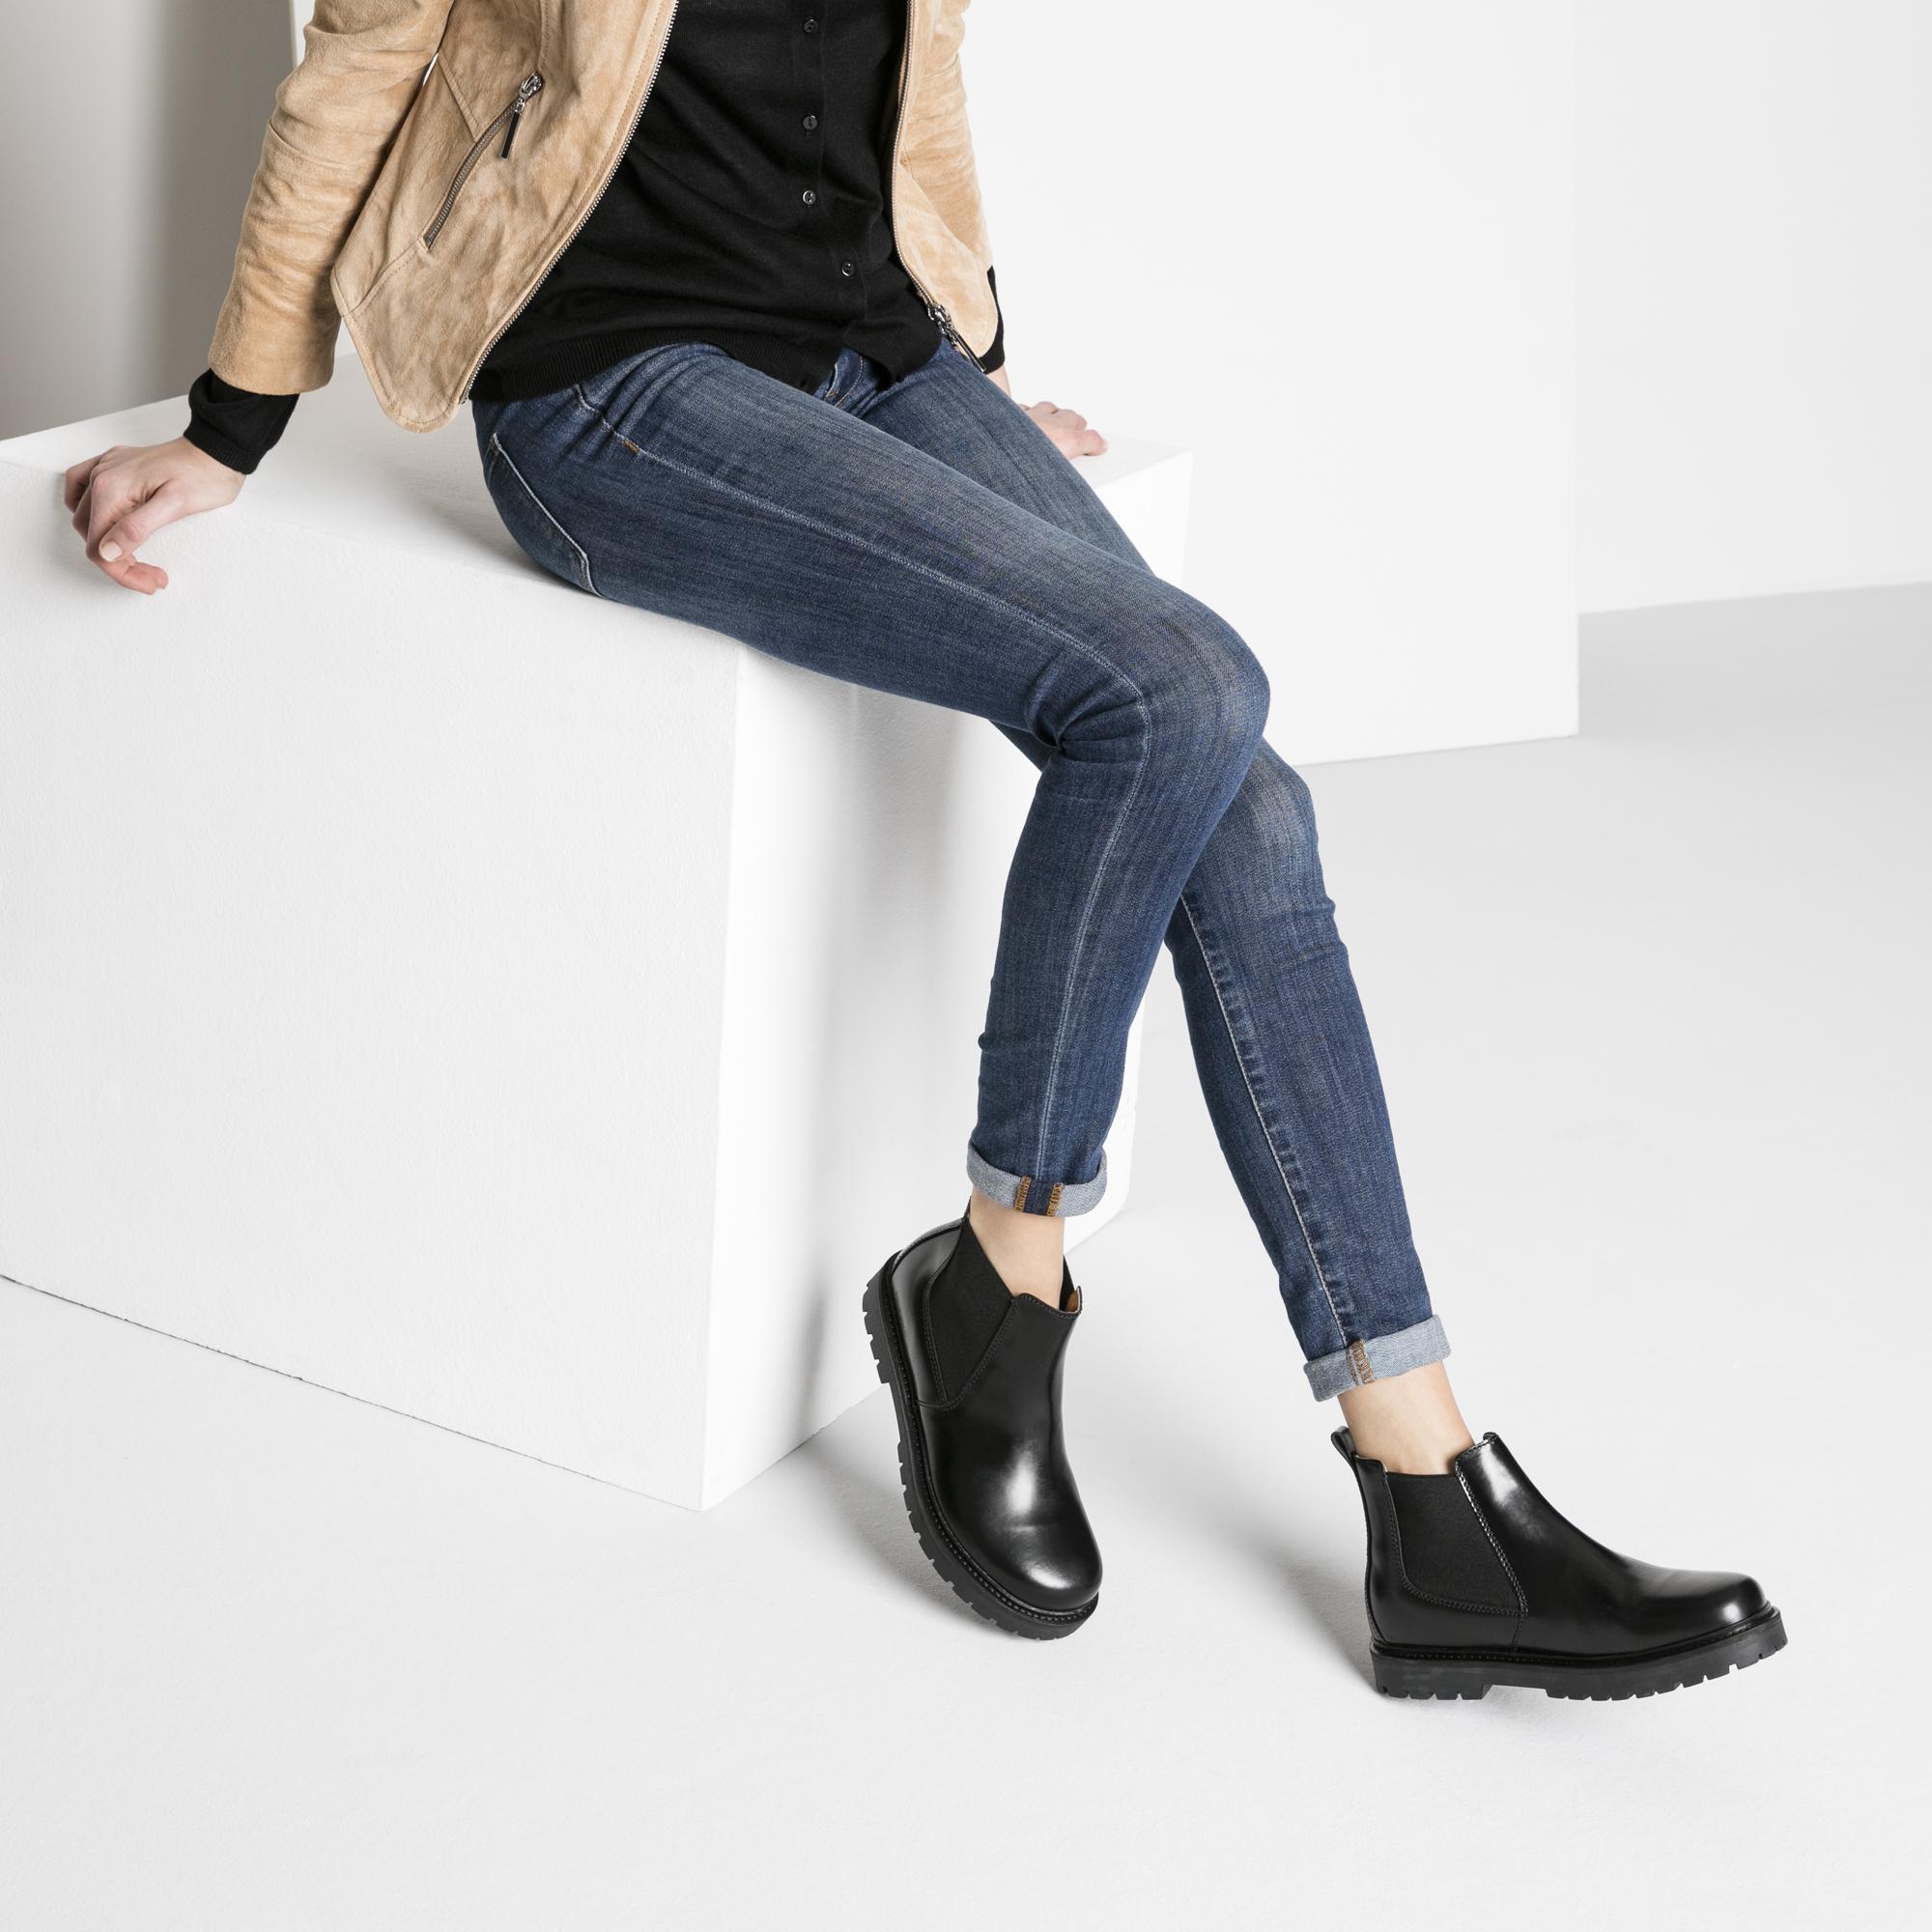 Stalon Natural Leather Black | shop